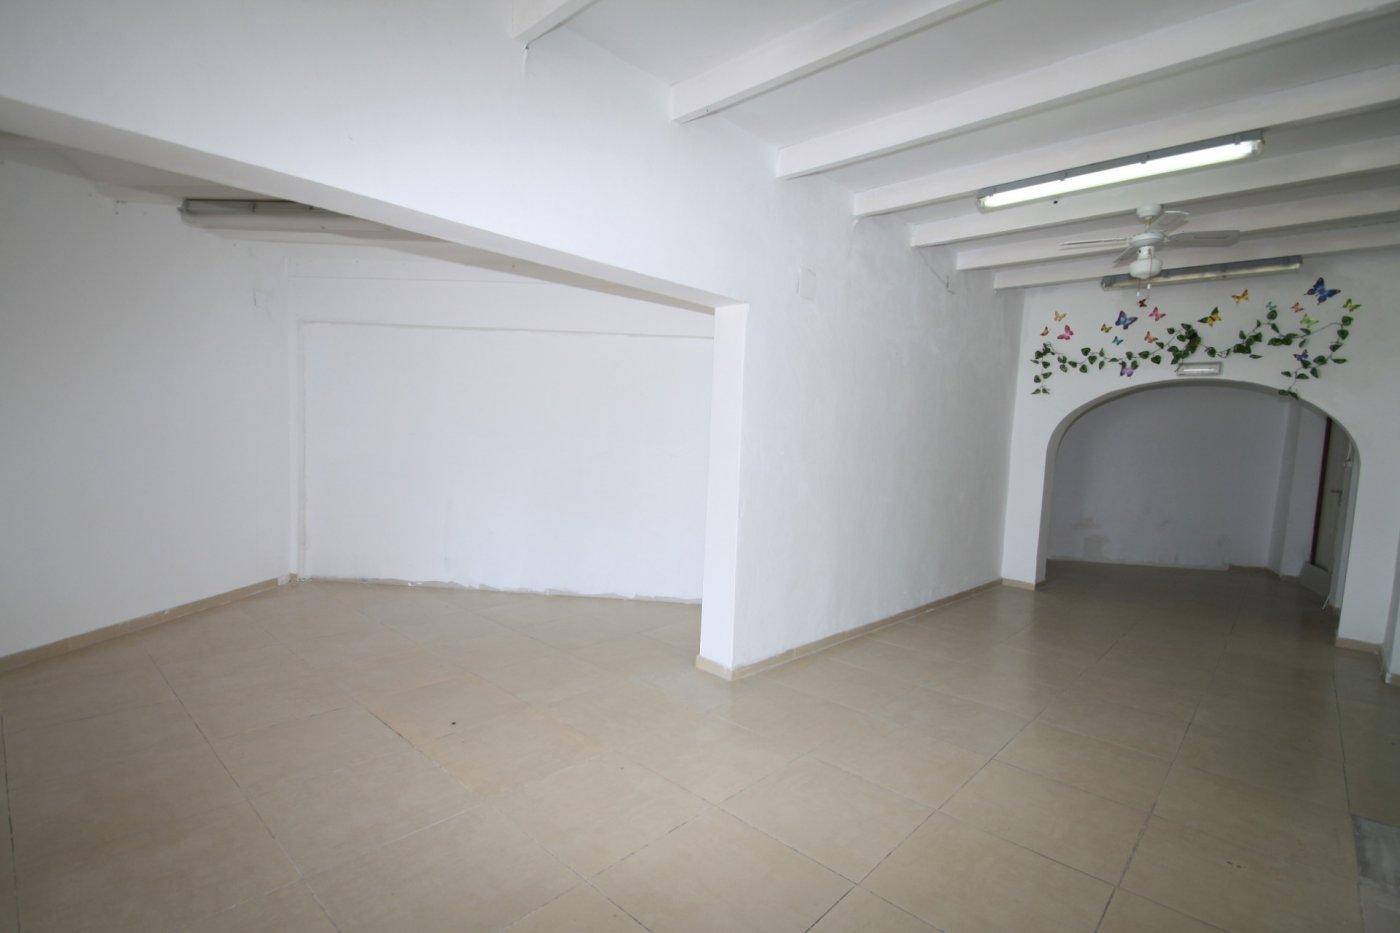 local-comercial en moraira · cap-blanc 1000€